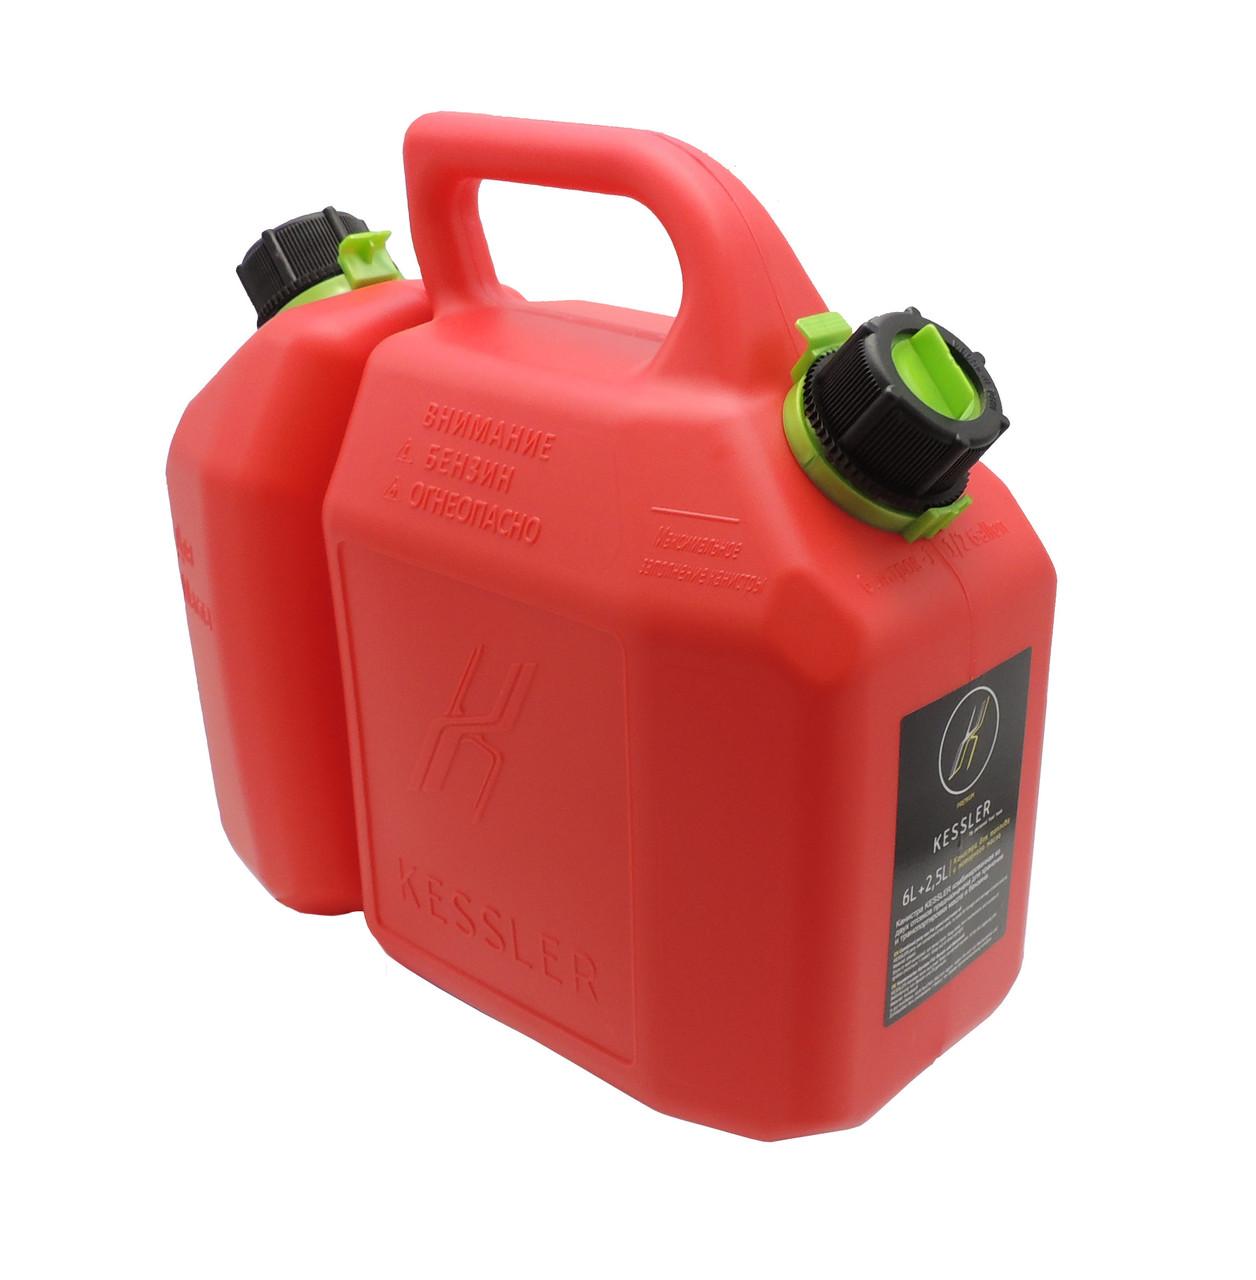 Канистра KESSLER комби 6+2,5 литров    ОПТОМ